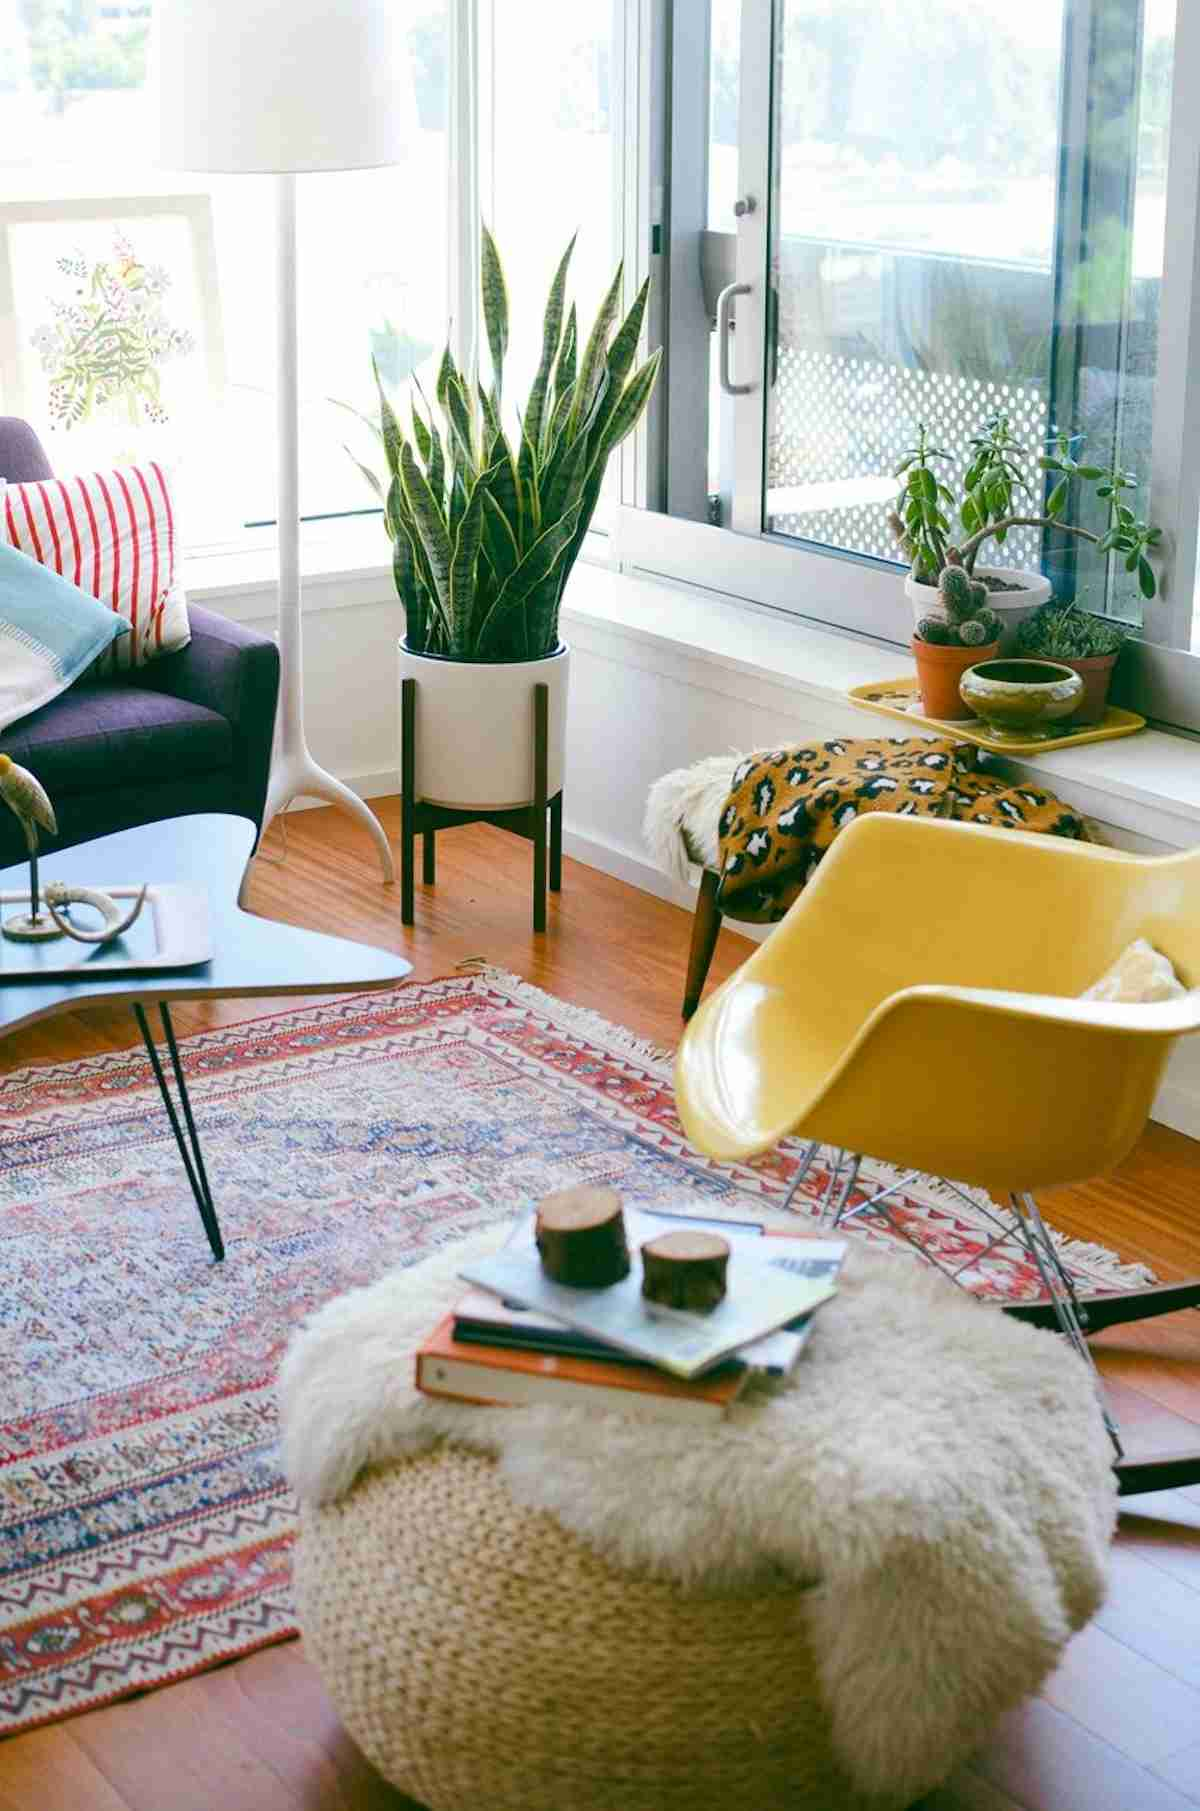 6 Plantas de invierno para decorar tu hogar 7